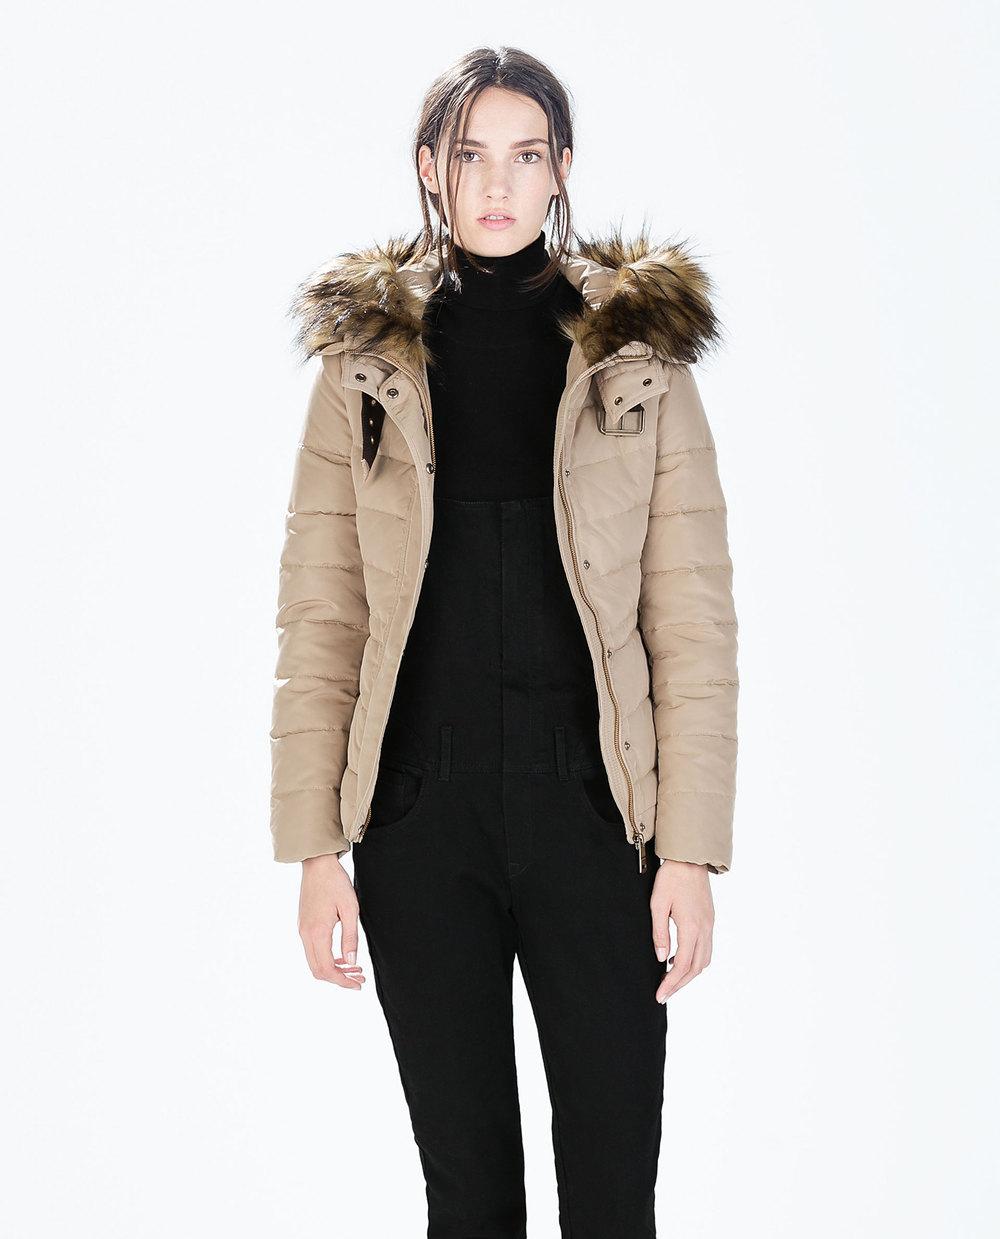 Short Puffer Jacket Coat Nj